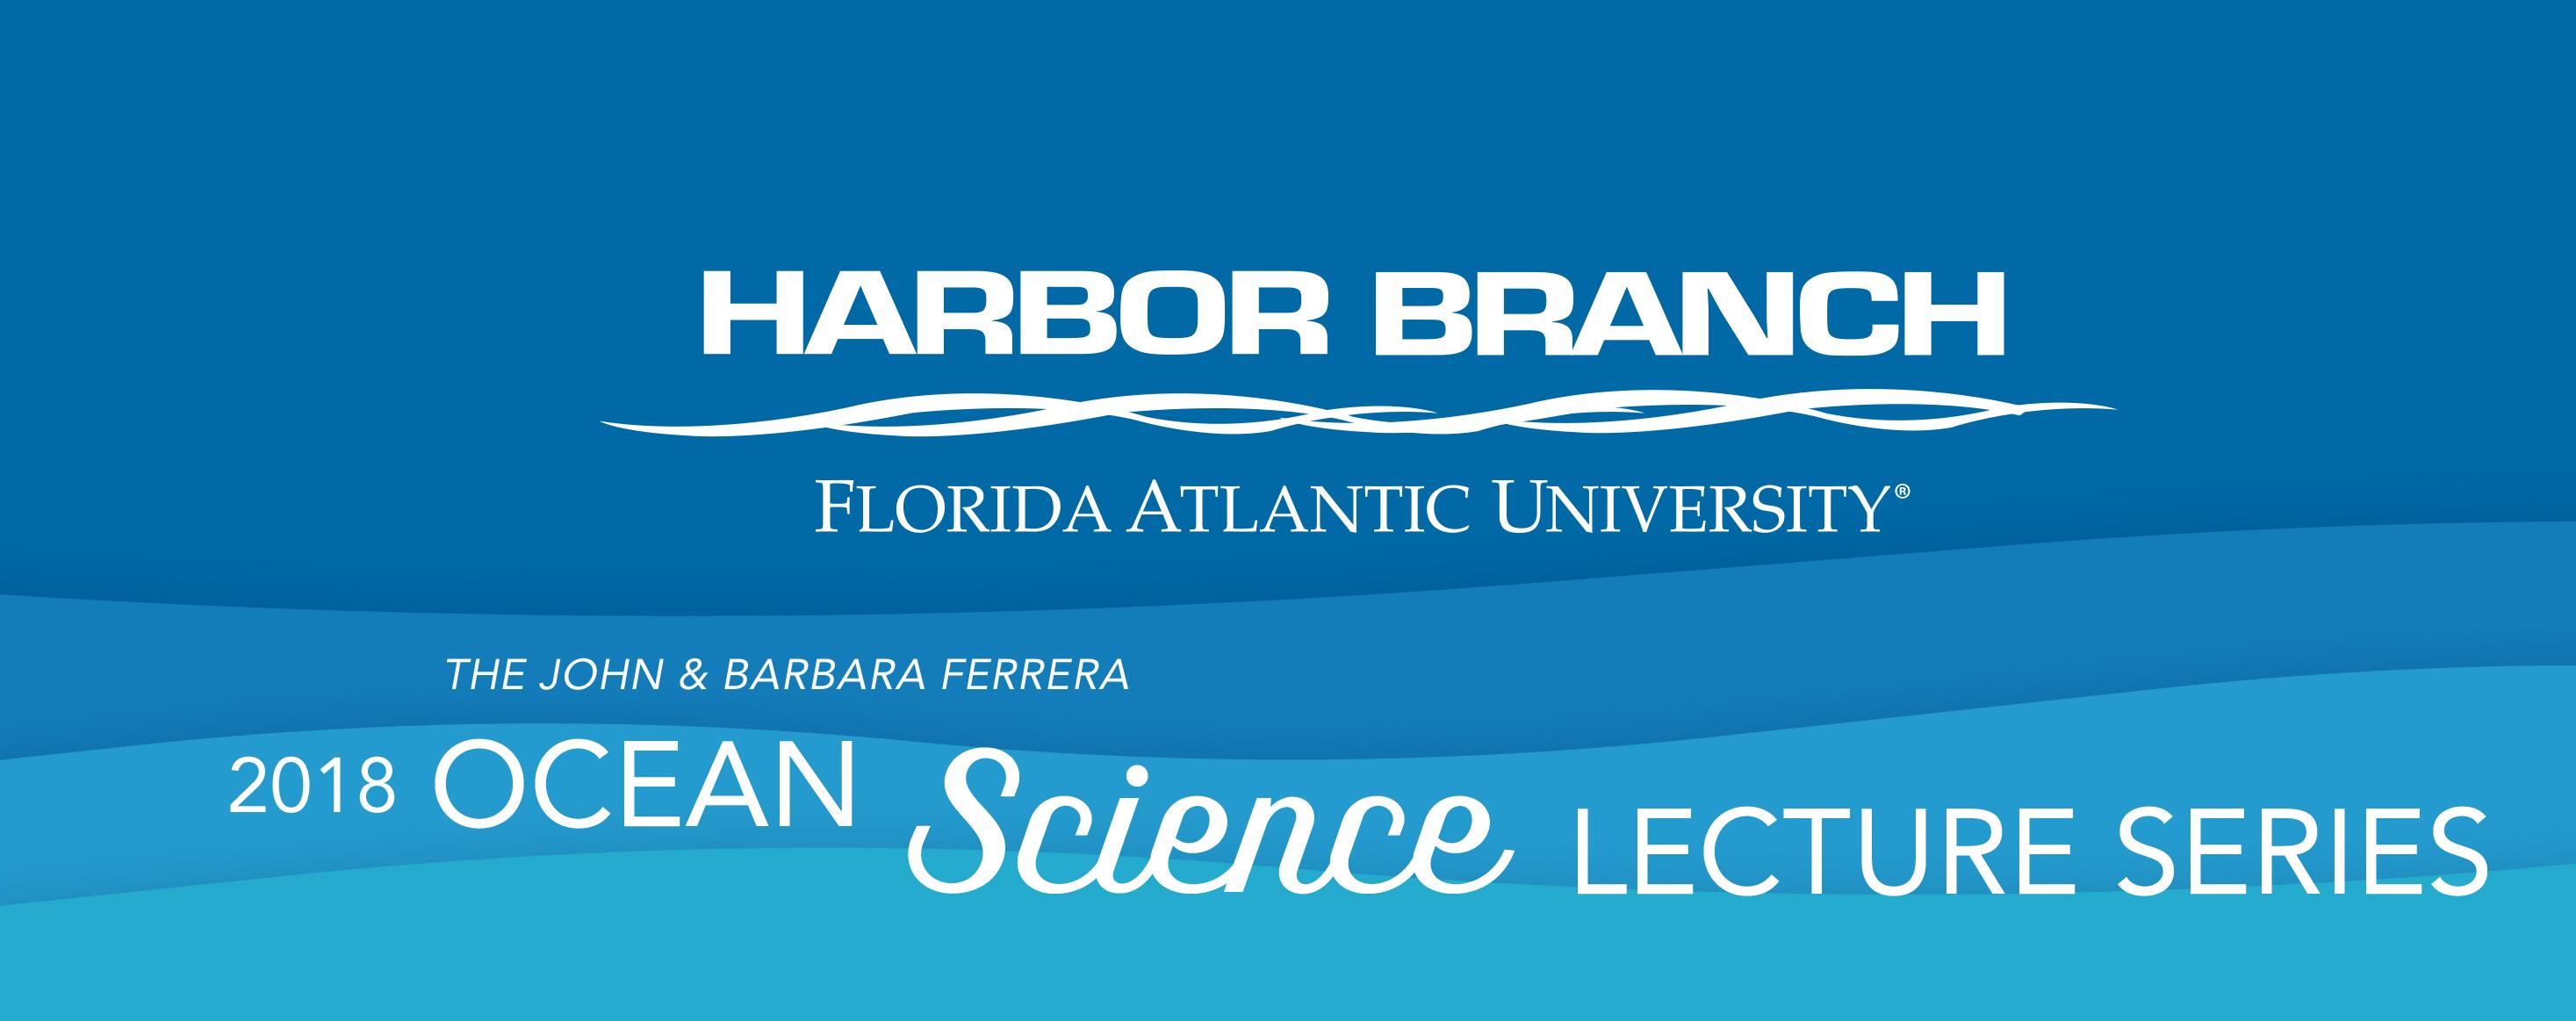 Fau Harbor Branch Ocean Science Lecture Series